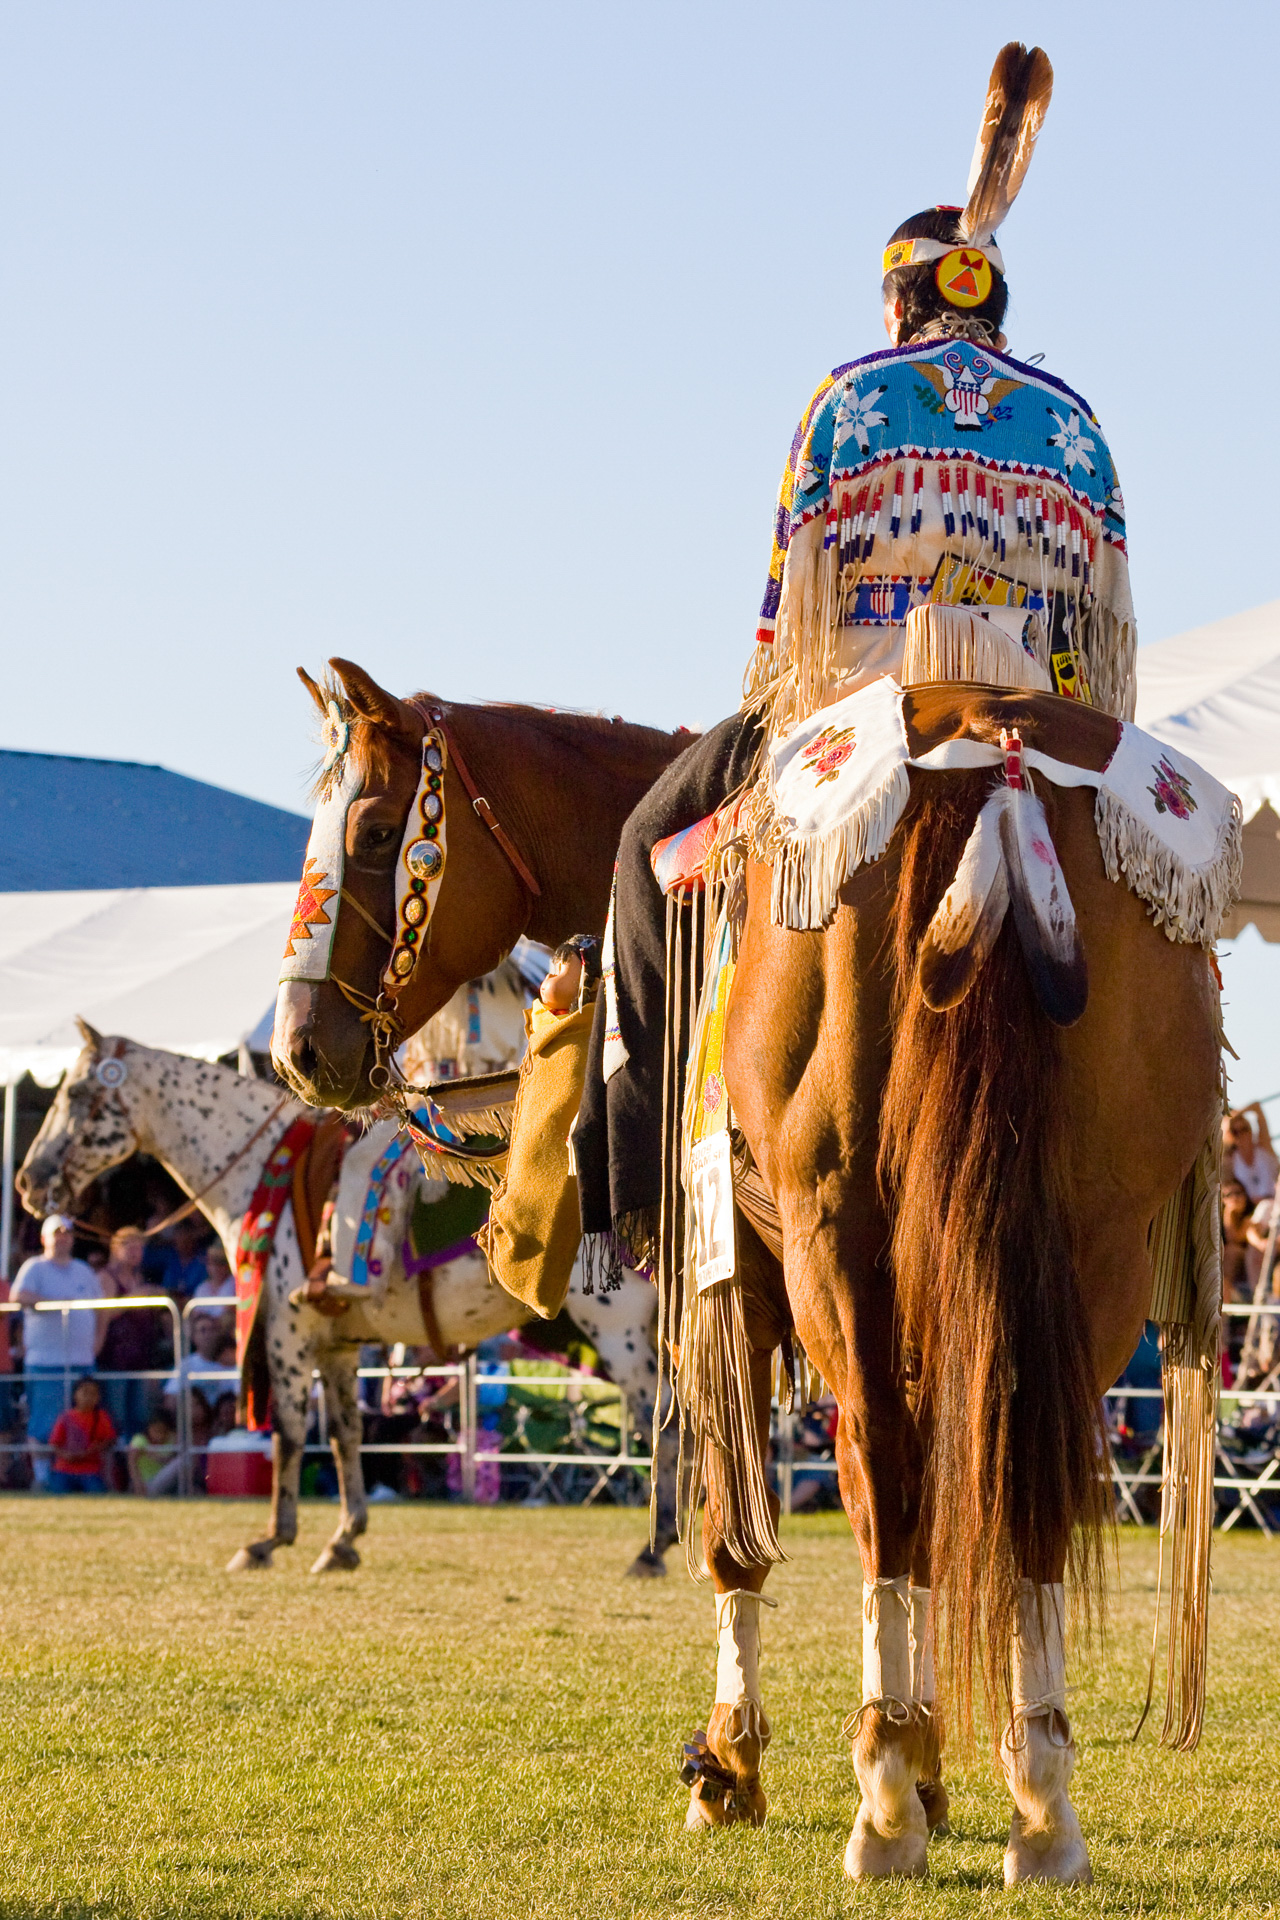 """Julyamsh Horses"" Julyamsh Post Falls, ID 2010"